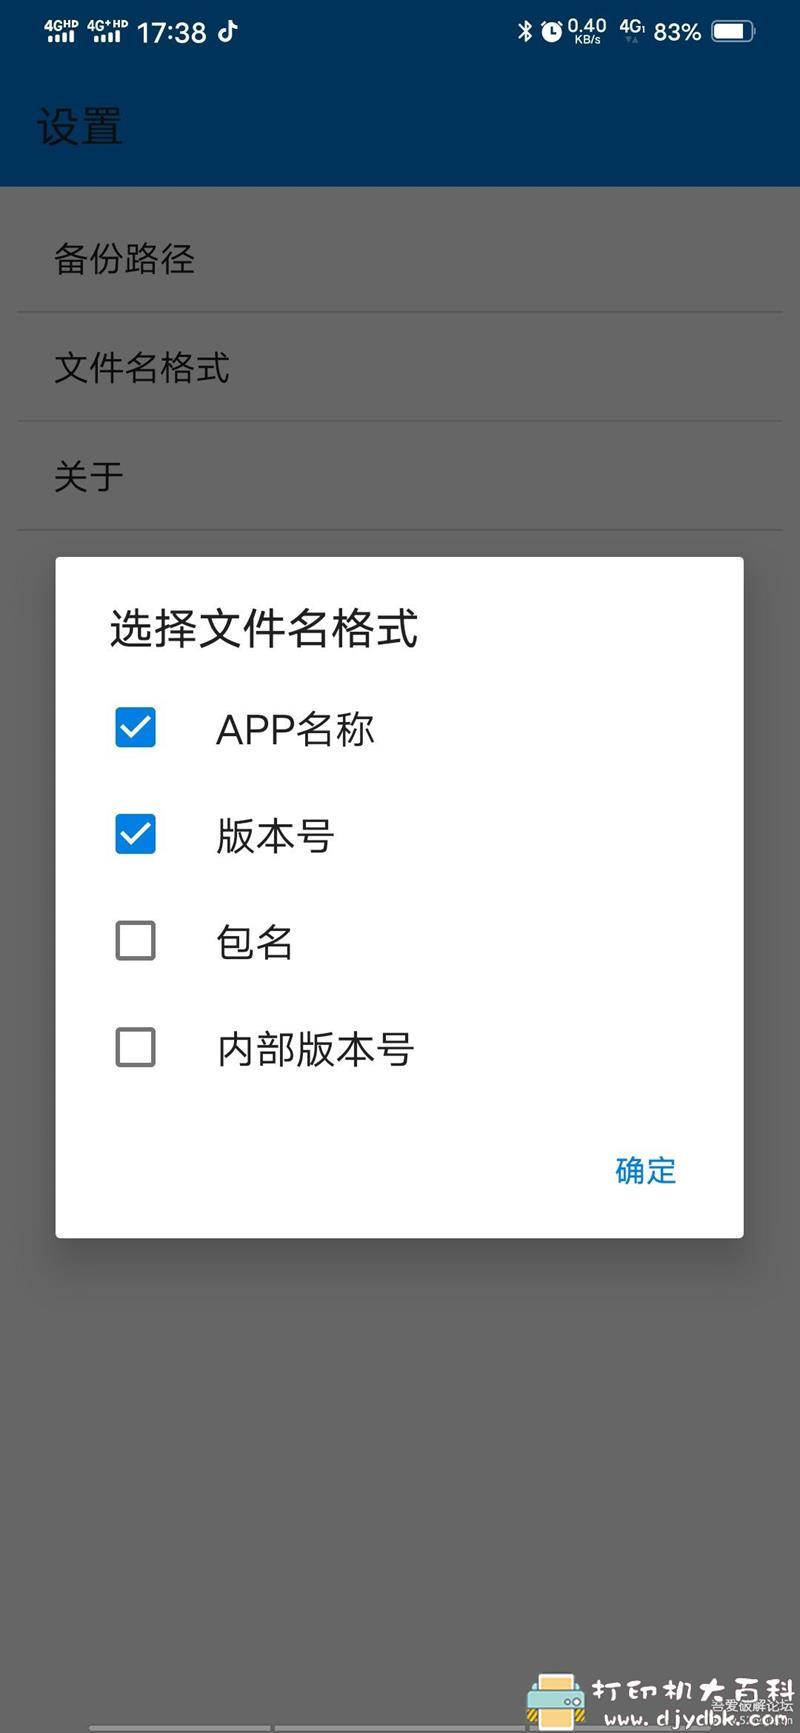 [Android]APK提取器1.3.7,提取手机已安装的应用 配图 No.2